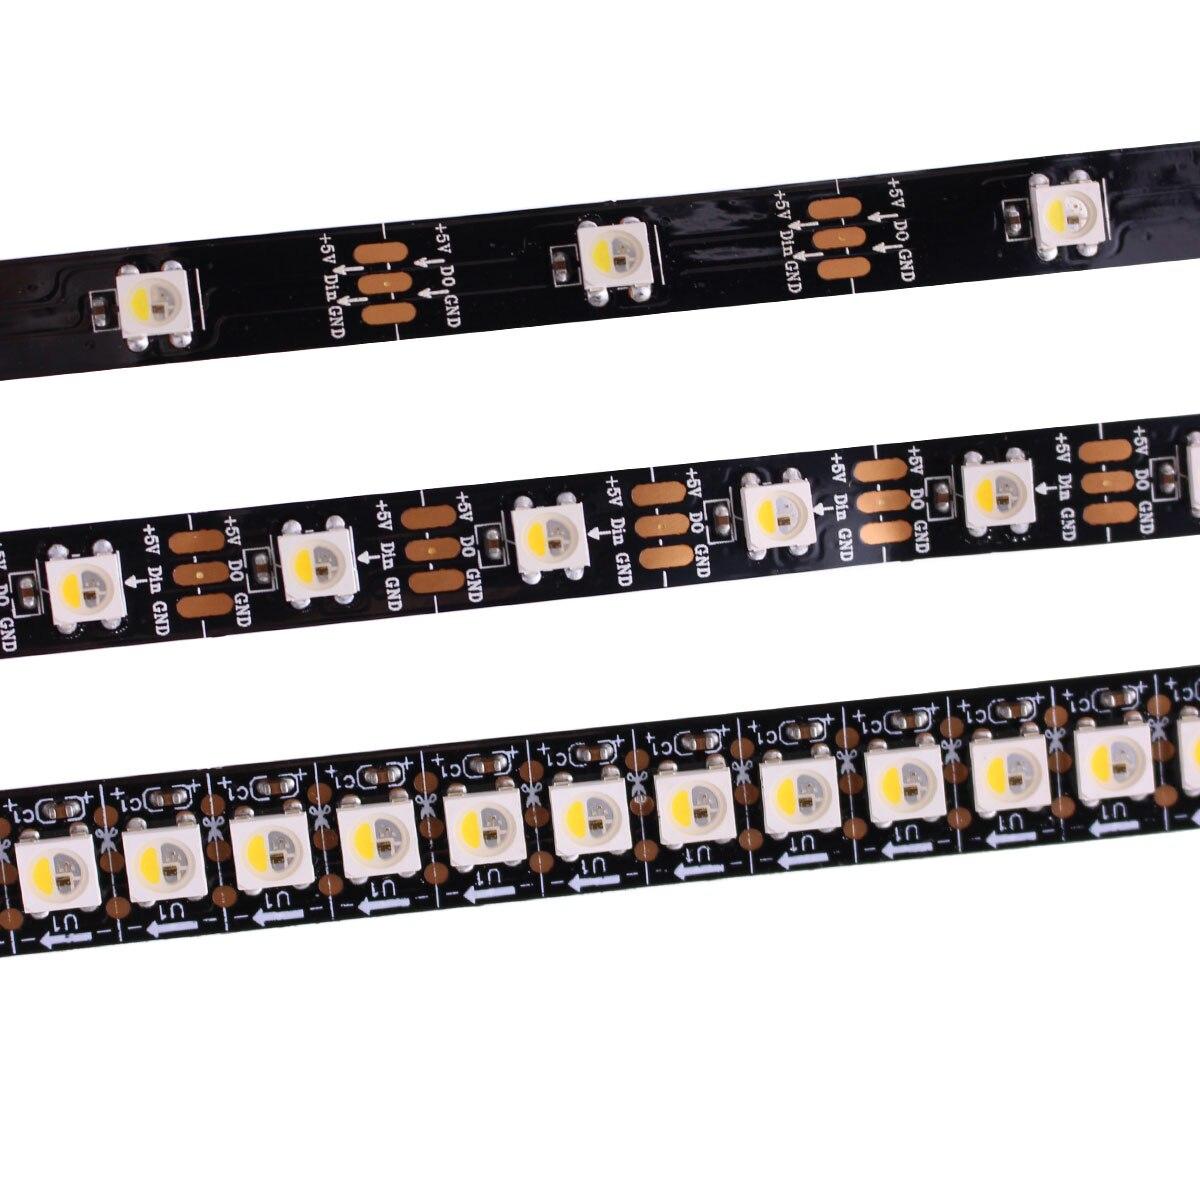 Best Price 1m 5m Addressable SK6812 RGBW RGBWW Led Strip Neutral White WWA Waterproof 30/60/144 Leds/pixles/m 5V Similar WS2812B